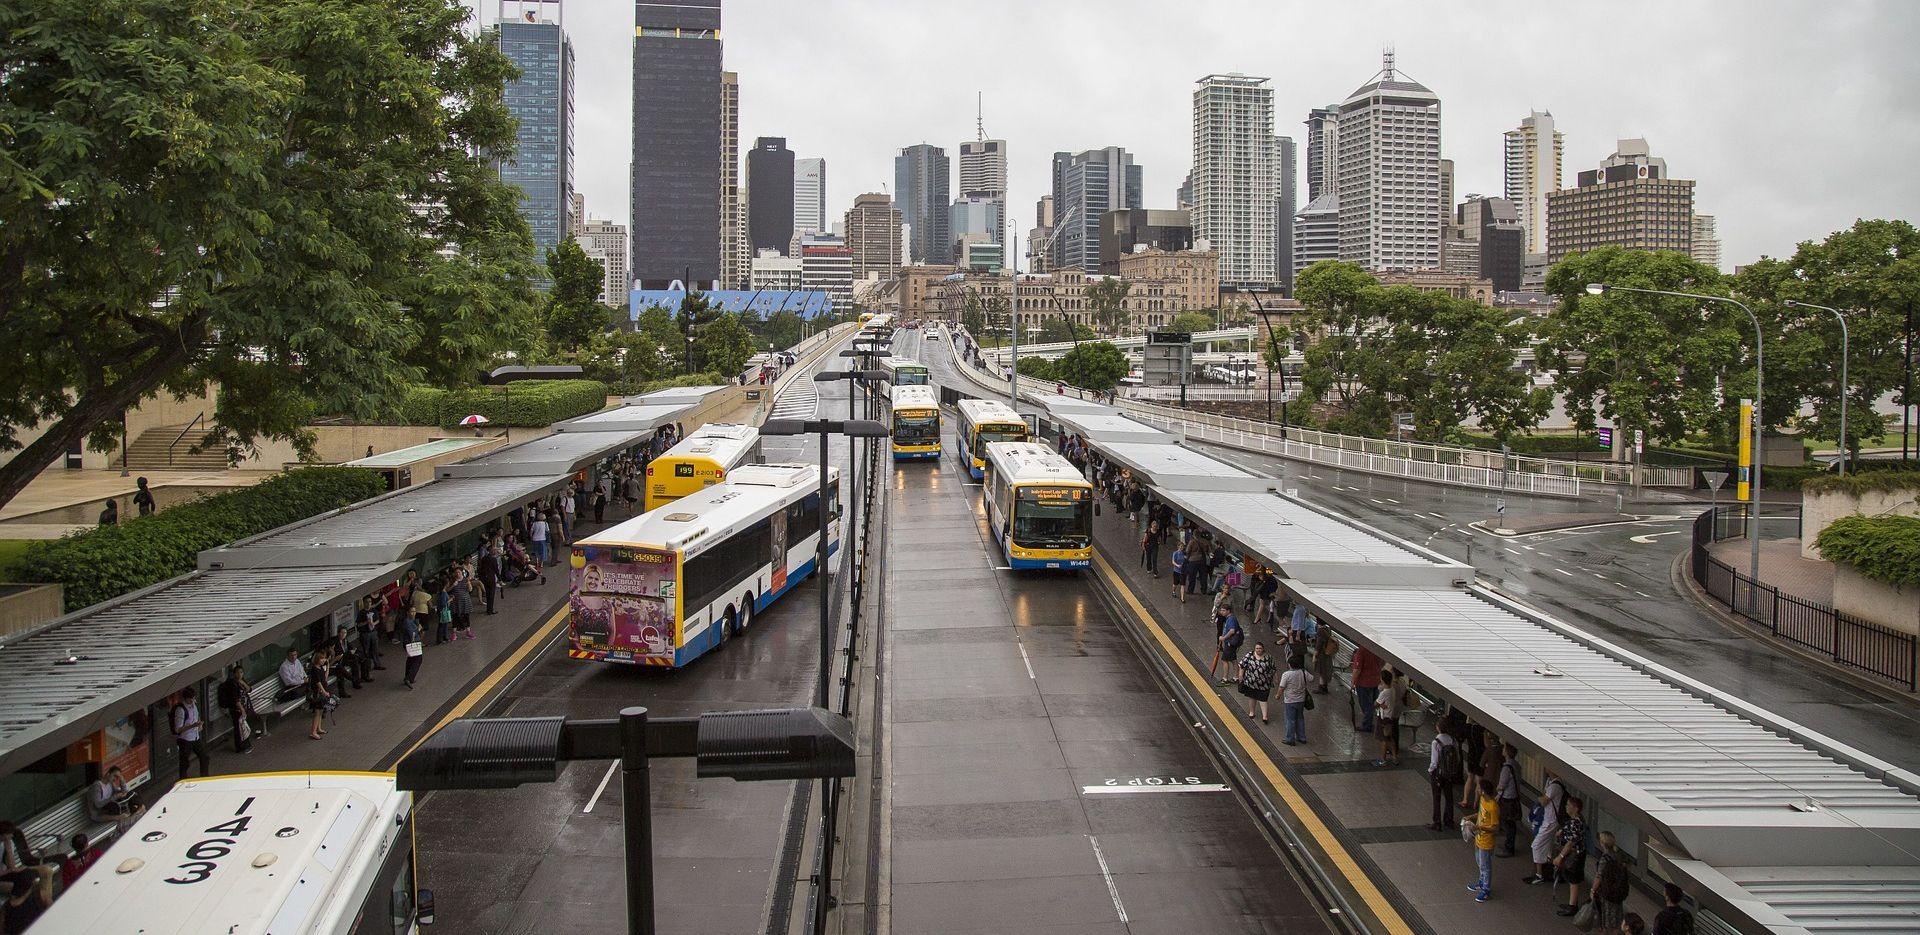 MOTIV NEPOZNAT Putnik zapalio vozača autobusa u Brisbaneu